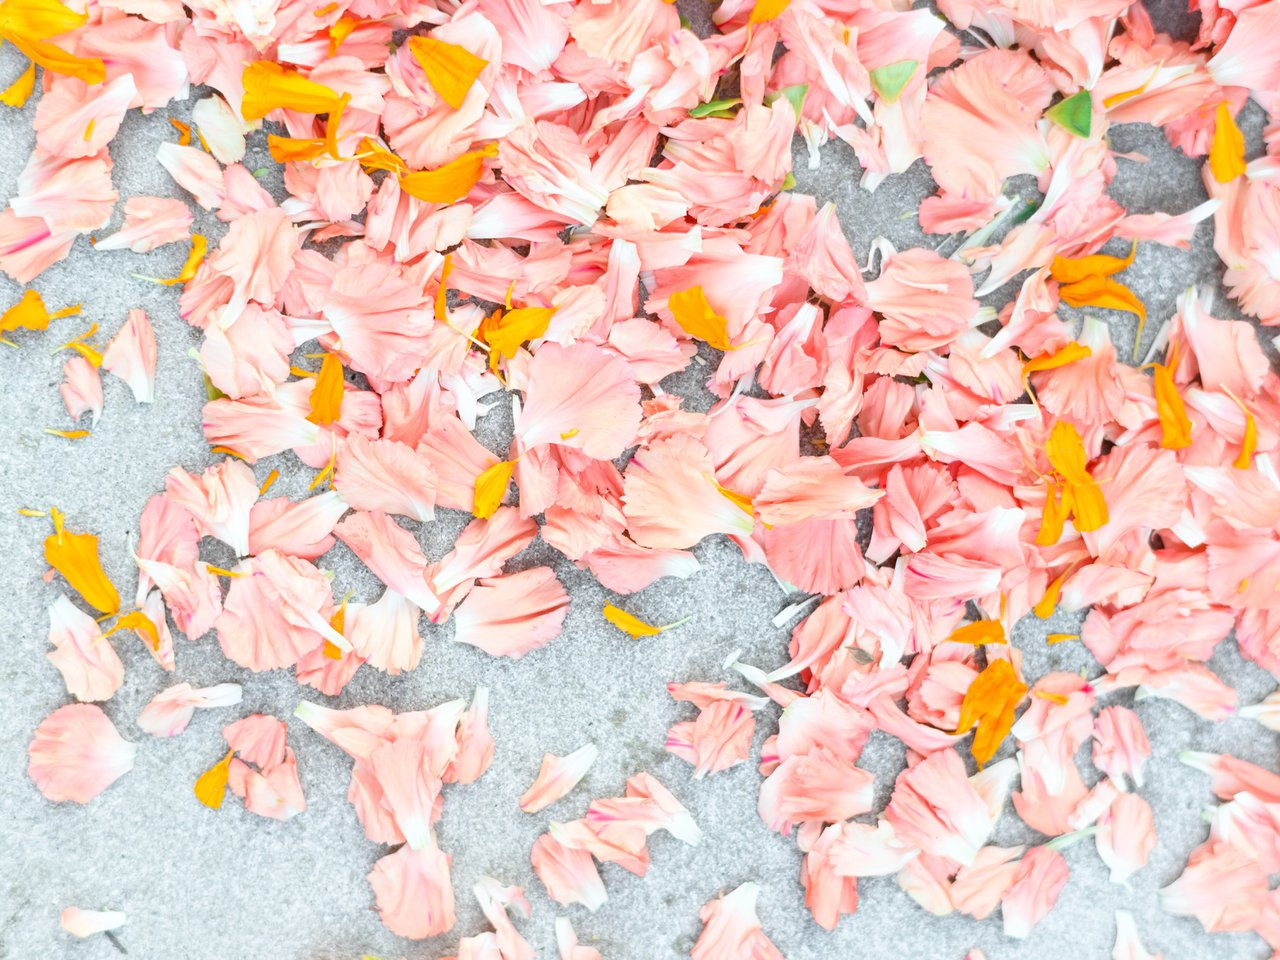 Dia de Los Muertos photo apiary-9792.jpg